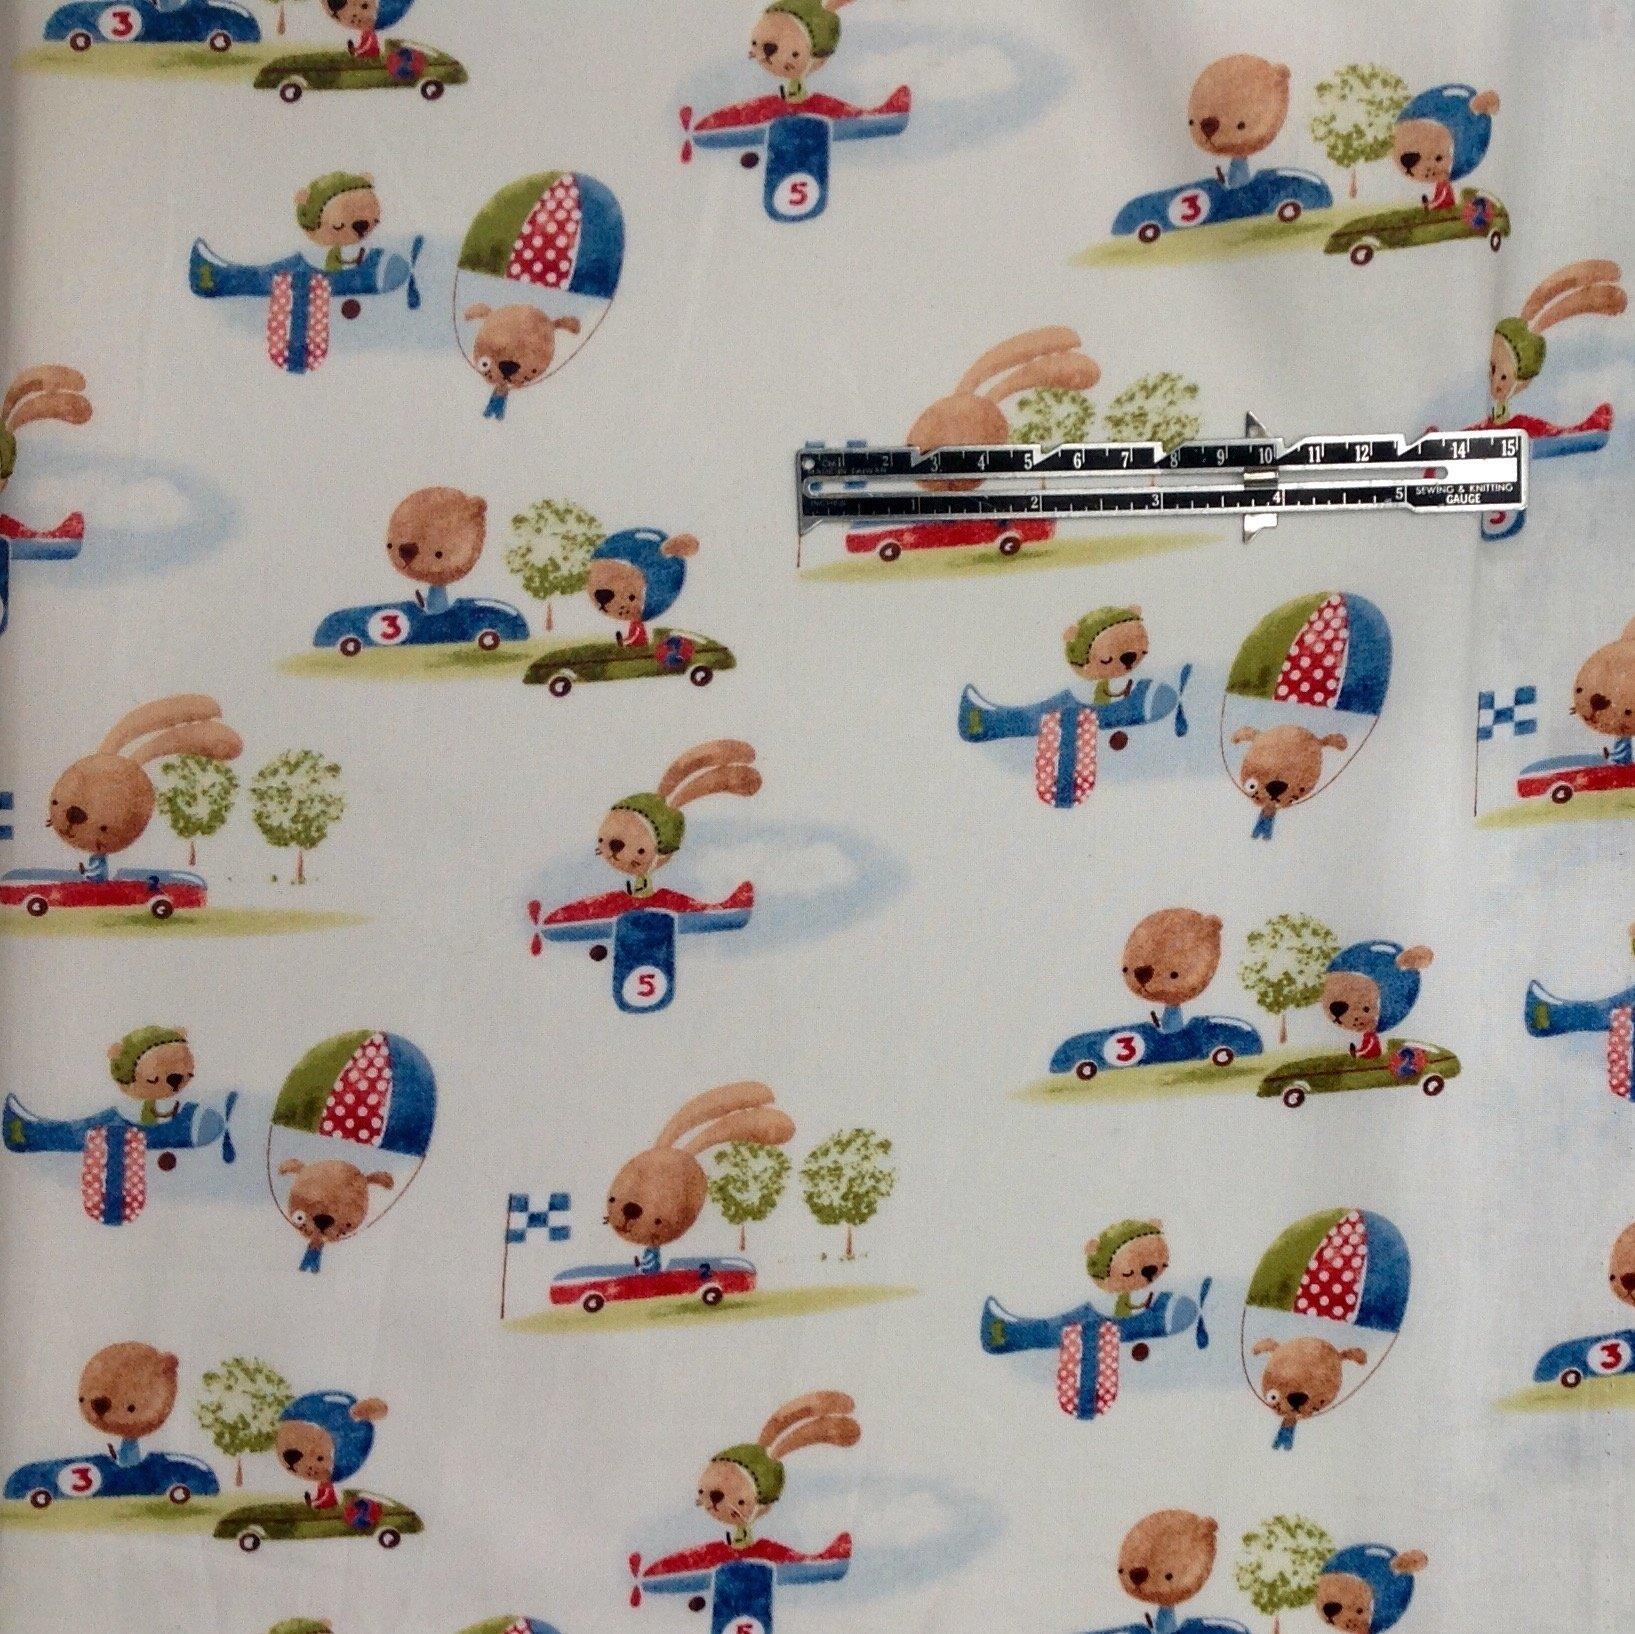 Playard Fitted Designer Handmade Mattress Sheet fits 28'' X 41'' X 2'' (Bear and Bunny Pilots)